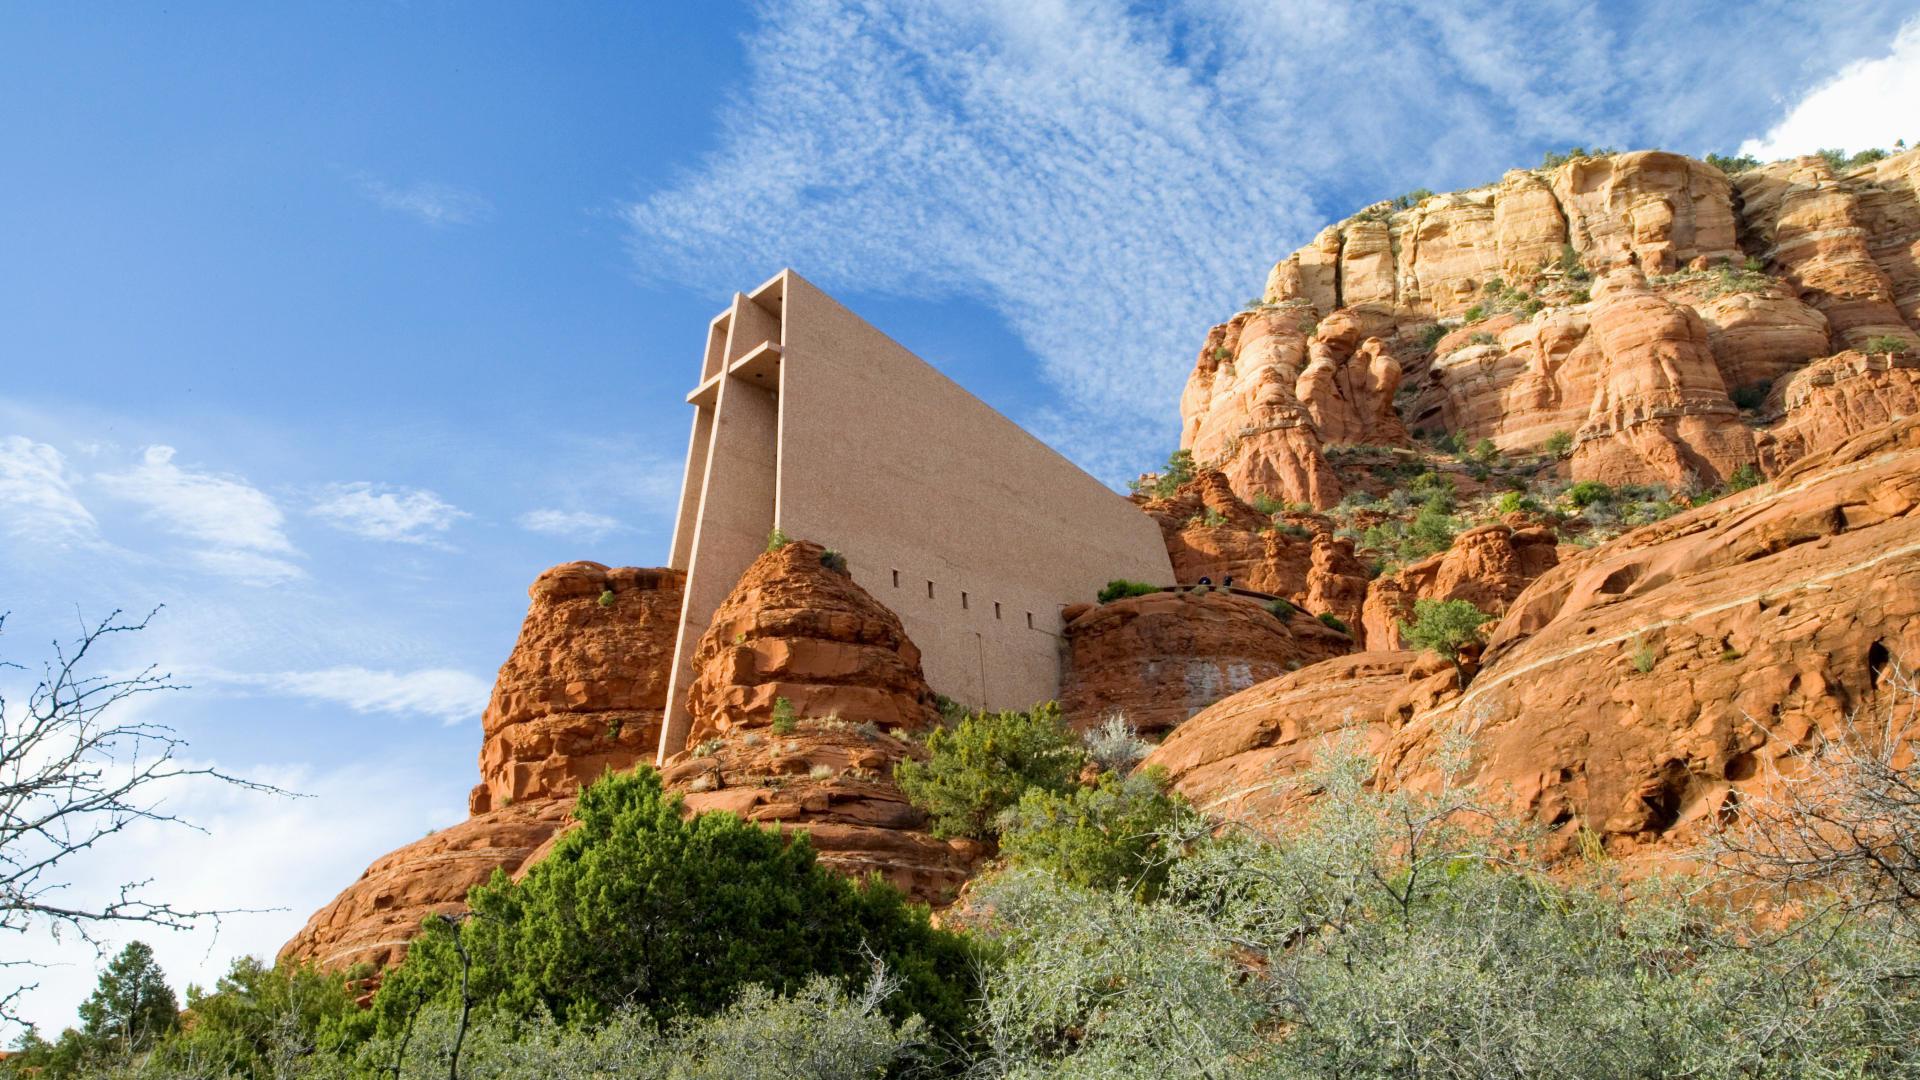 Chapel of the Holy Cross, Sedona, Arizona. [Desktop wallpaper 1920×1080]